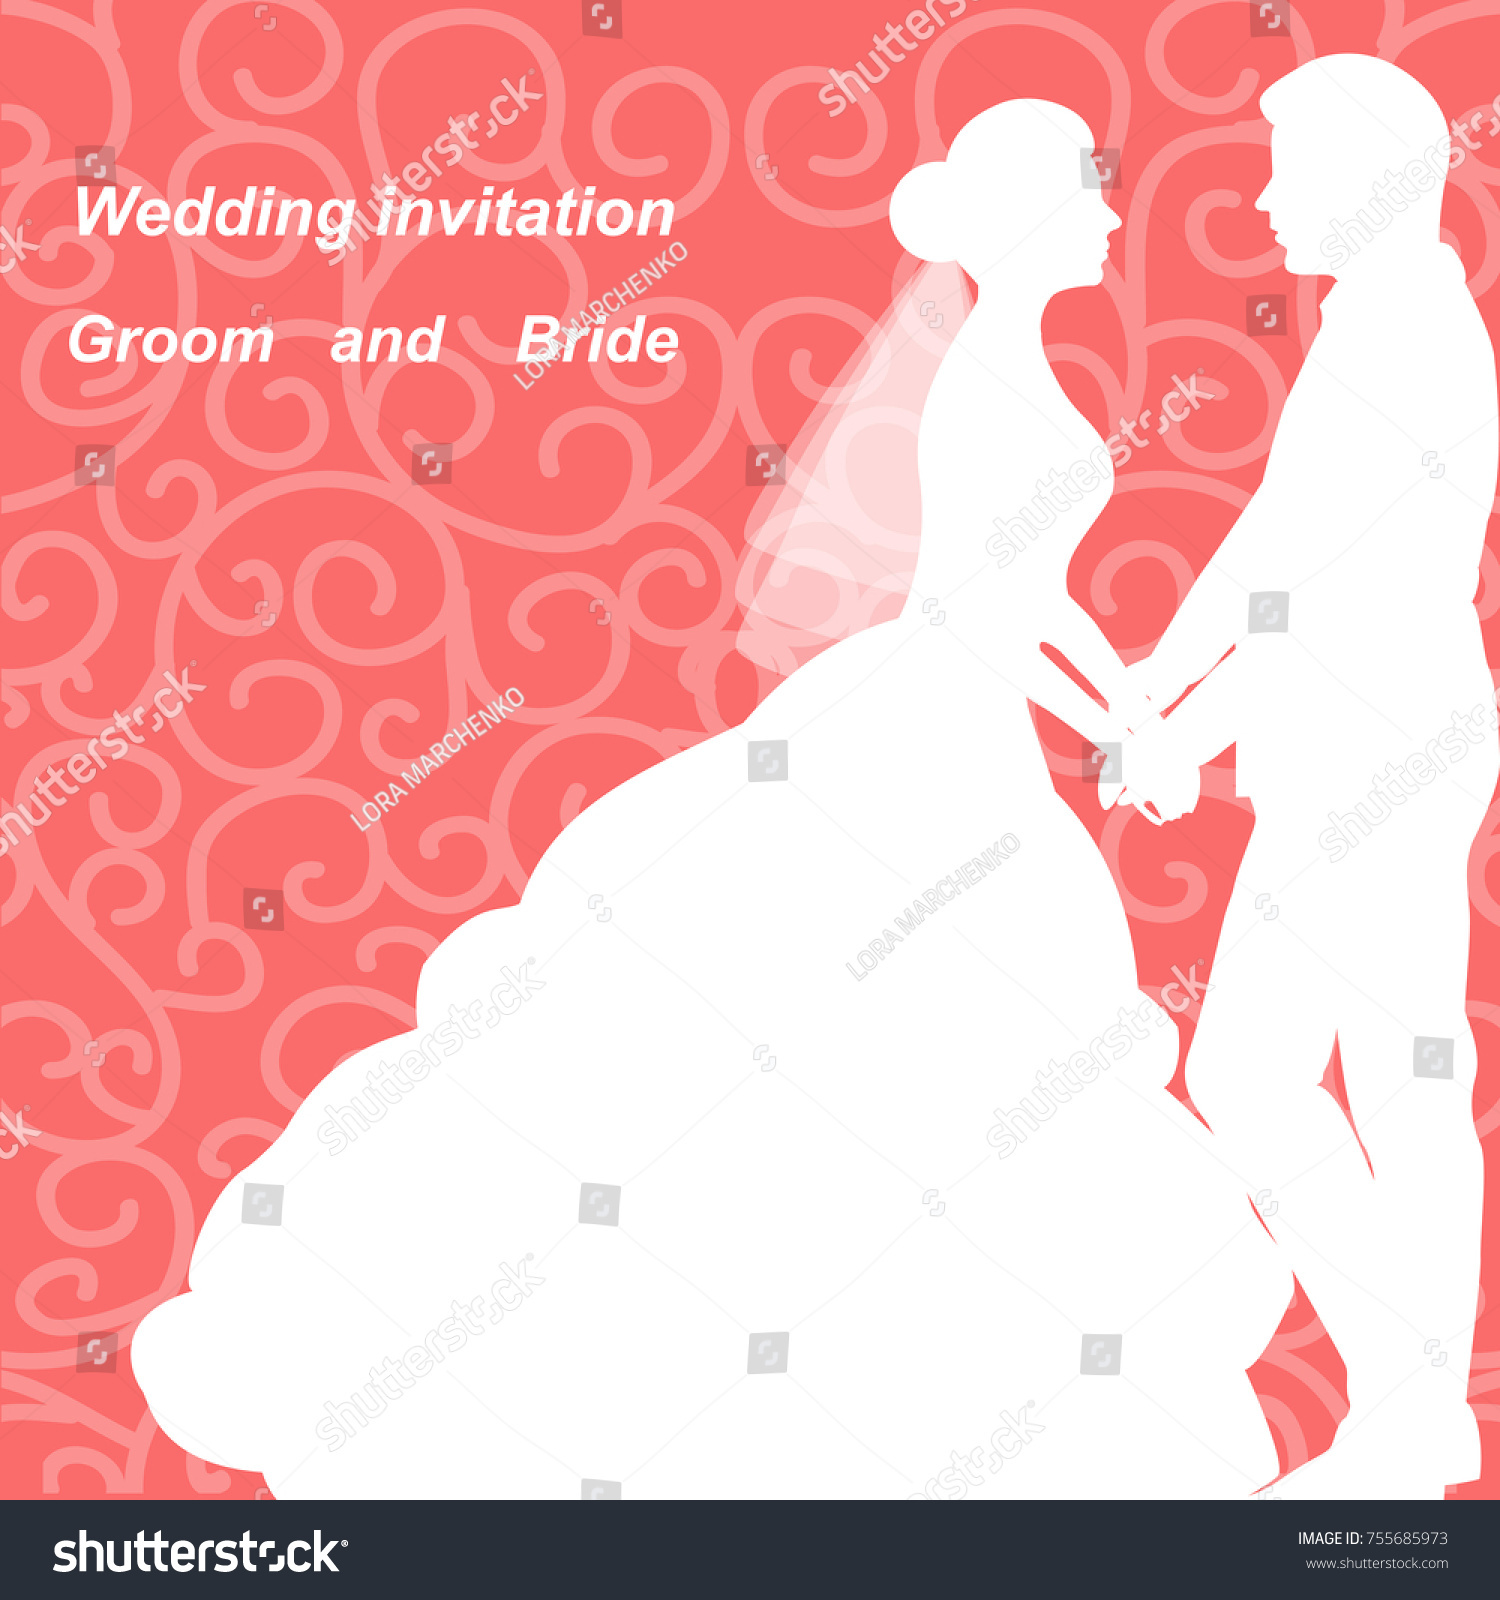 Wedding Invitation Bride Groom On Abstract Stock Illustration ...